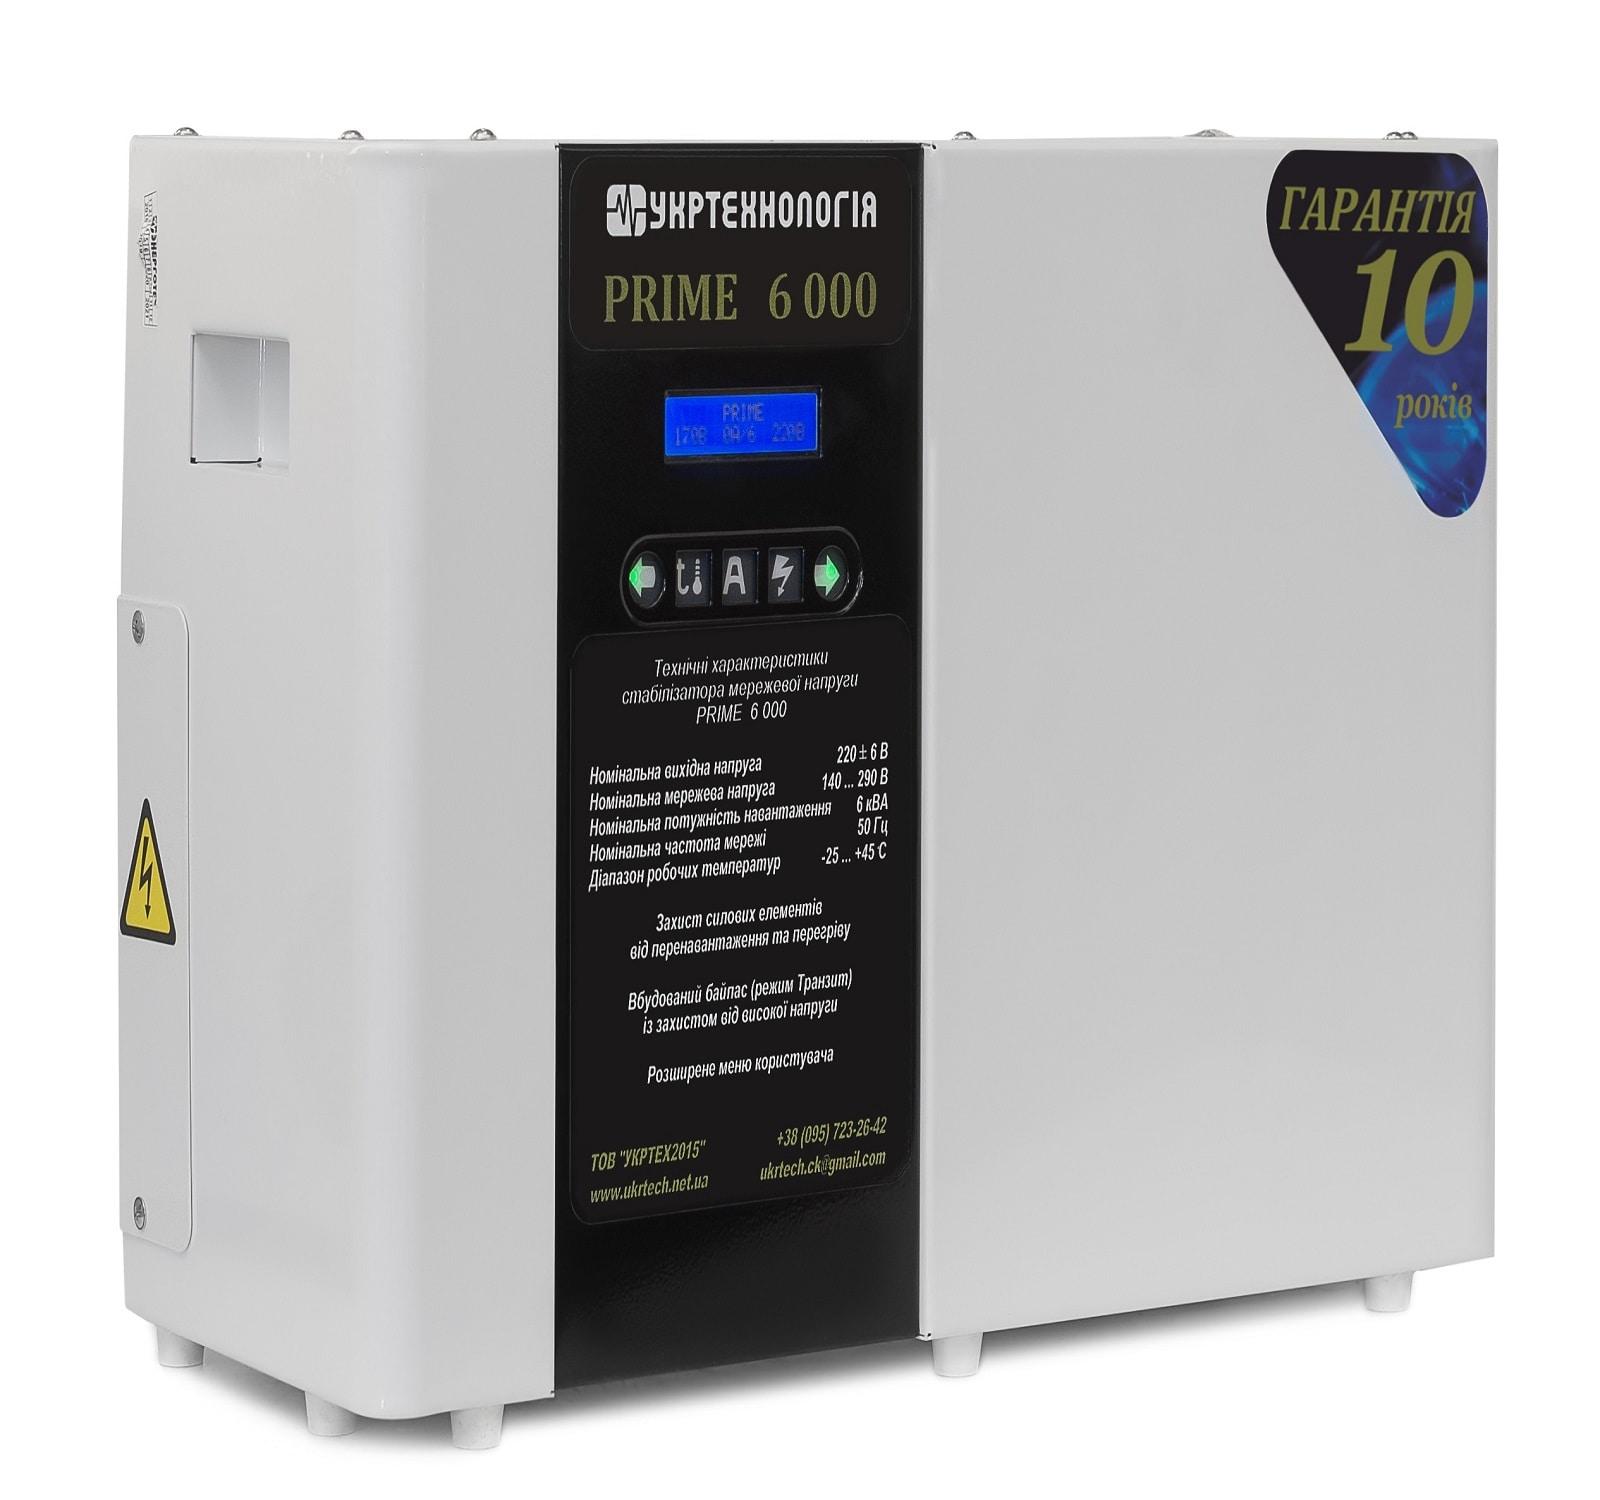 Стабилизаторы напряжения - Стабилизатор напряжения 6 кВт РRIME 000001453 - Фото 3